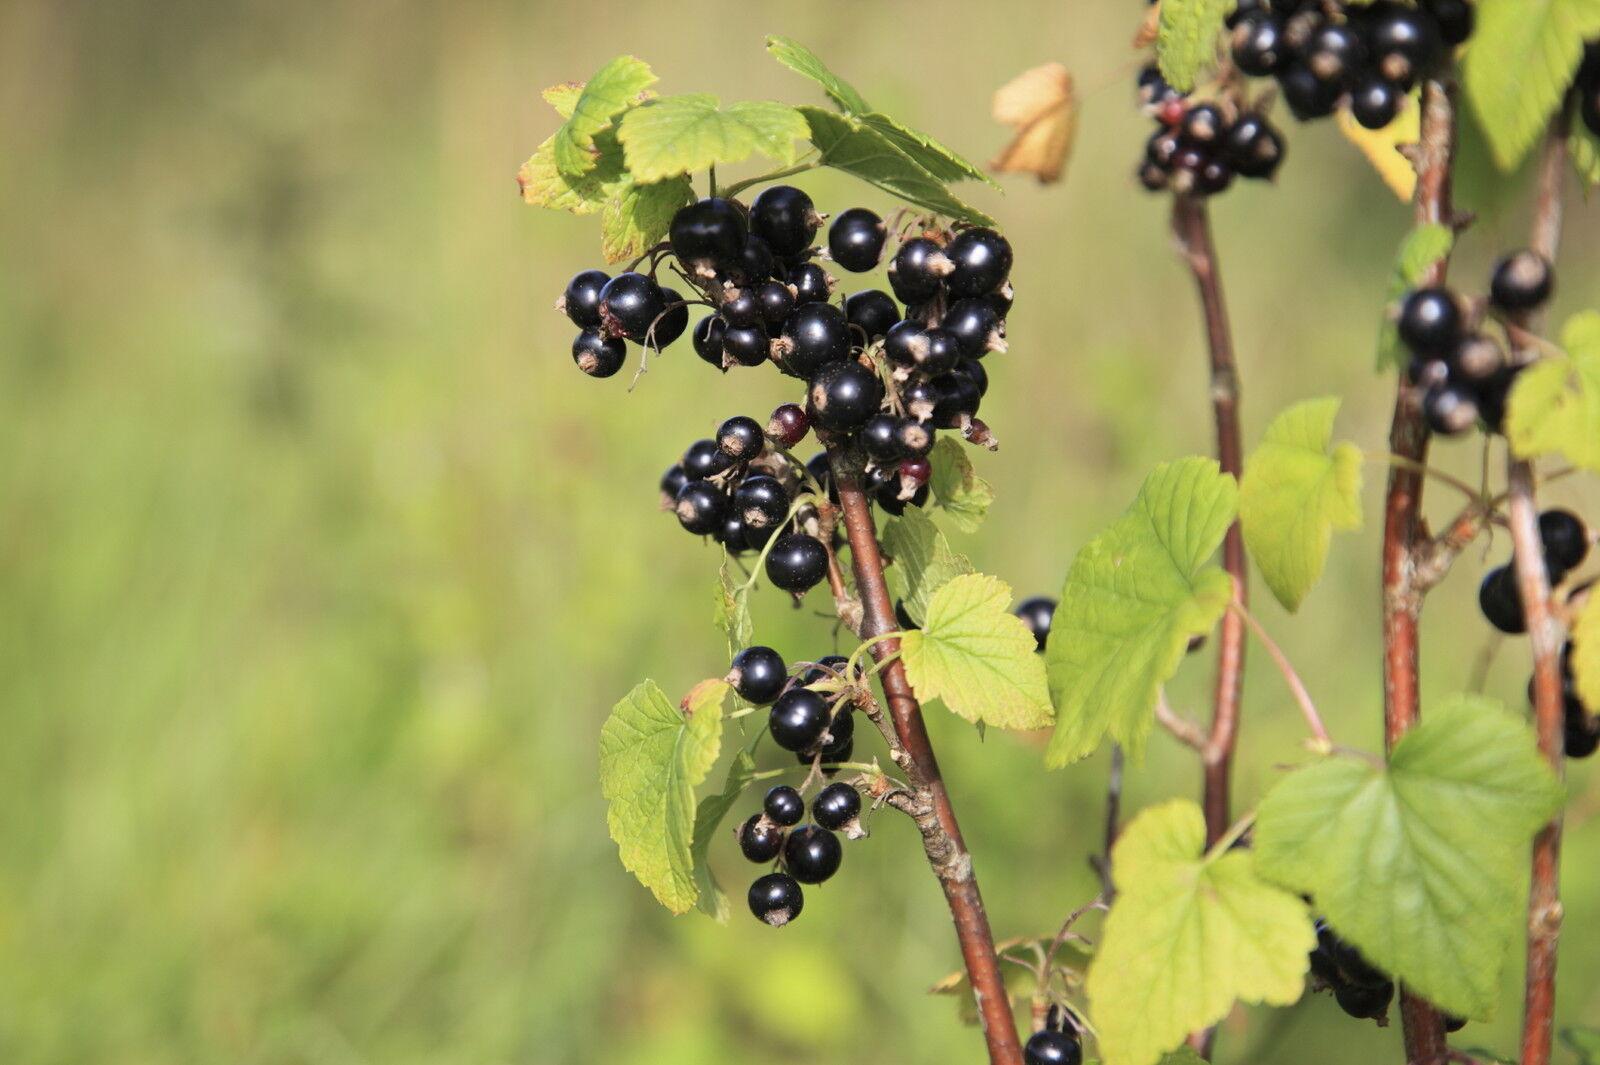 1 Blackcurrant Bush Ben Nevis Multistemmed Plant 2-3ft Tall 3fatpigs/®